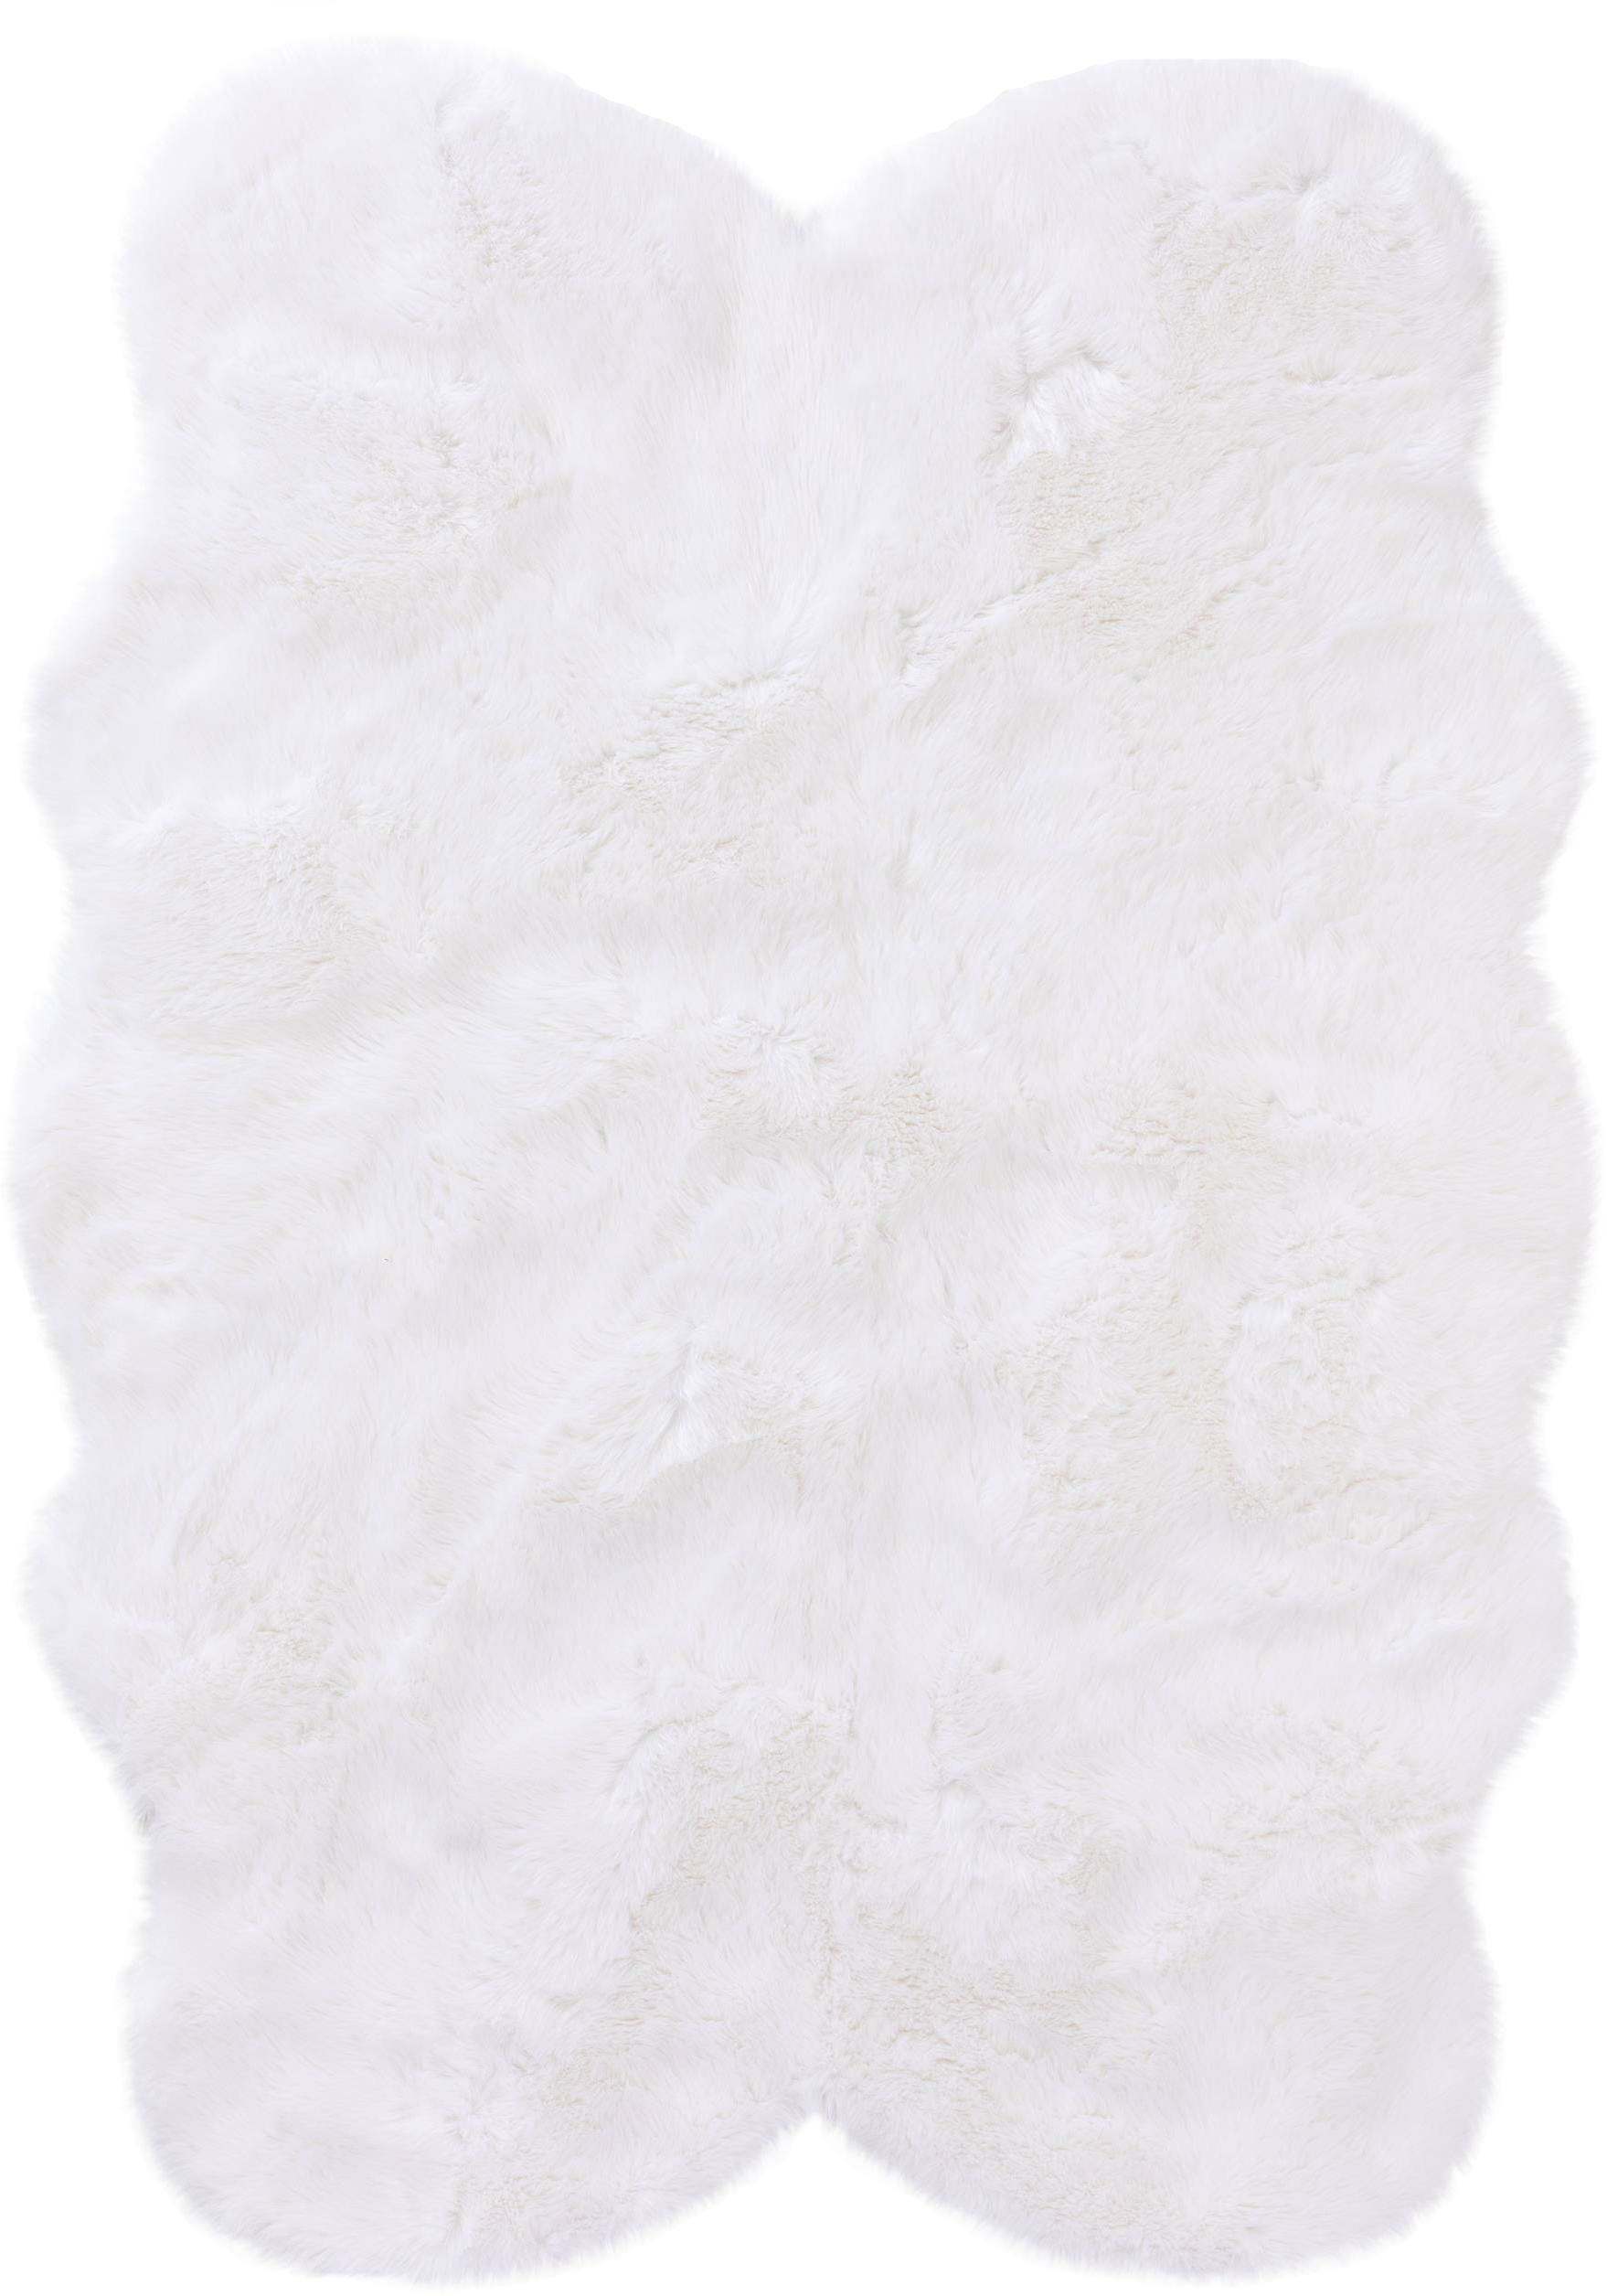 Kunstfell-Teppich Elmo, glatt, Flor: 50% Acryl, 50% Polyester, Weiß, B 140 x L 200 cm (Größe S)